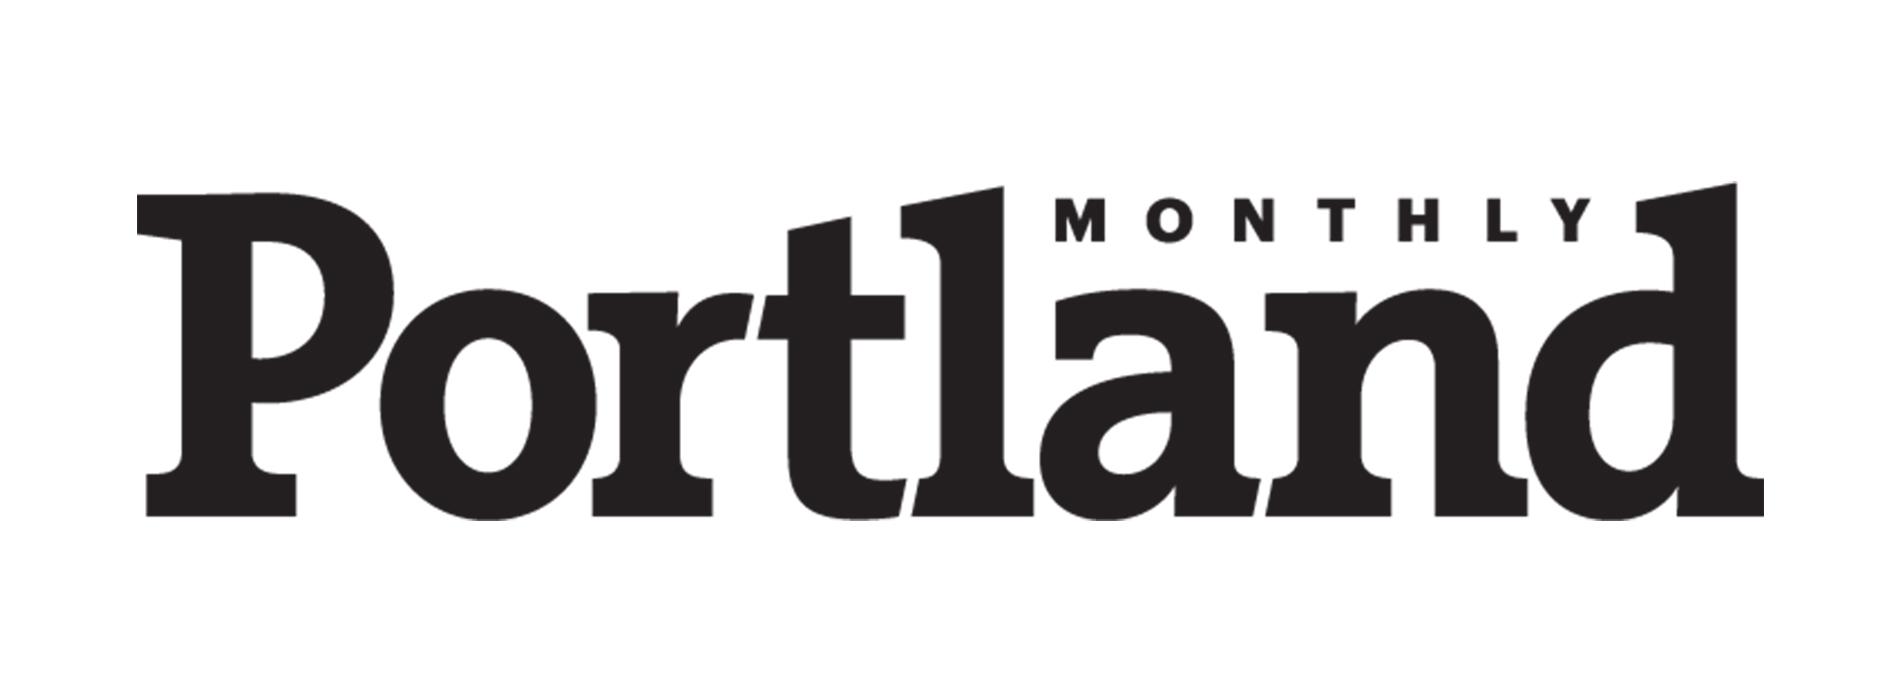 monthly portland.jpg